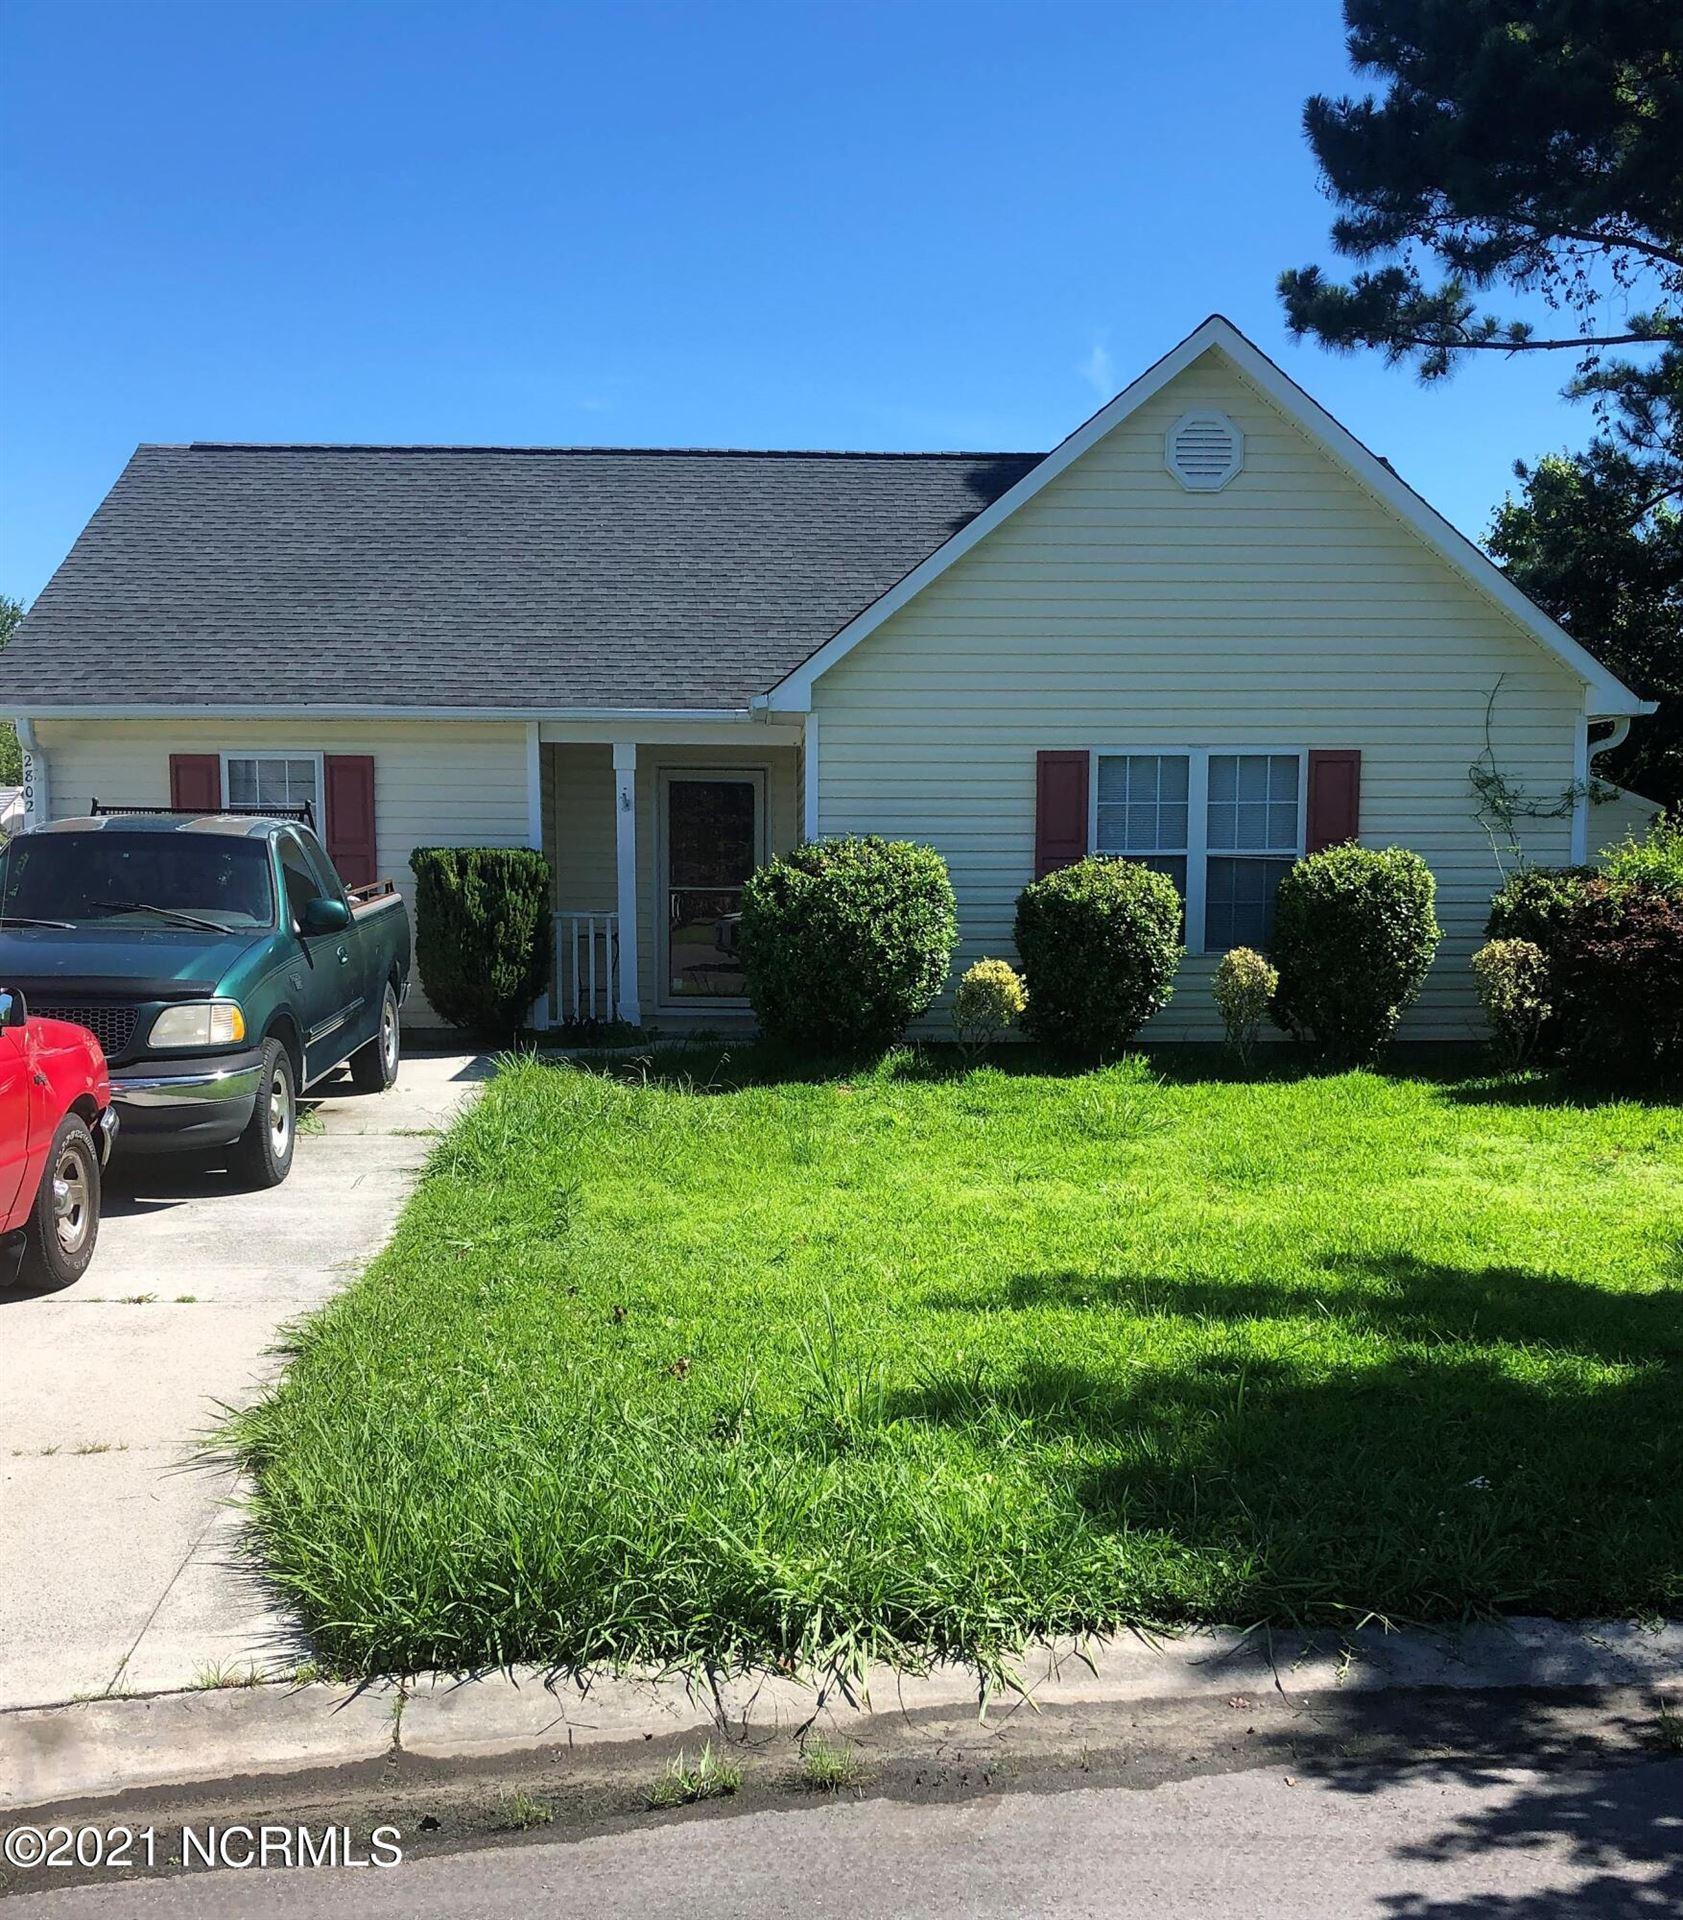 Photo for 2802 Miranda Court, Wilmington, NC 28405 (MLS # 100277990)